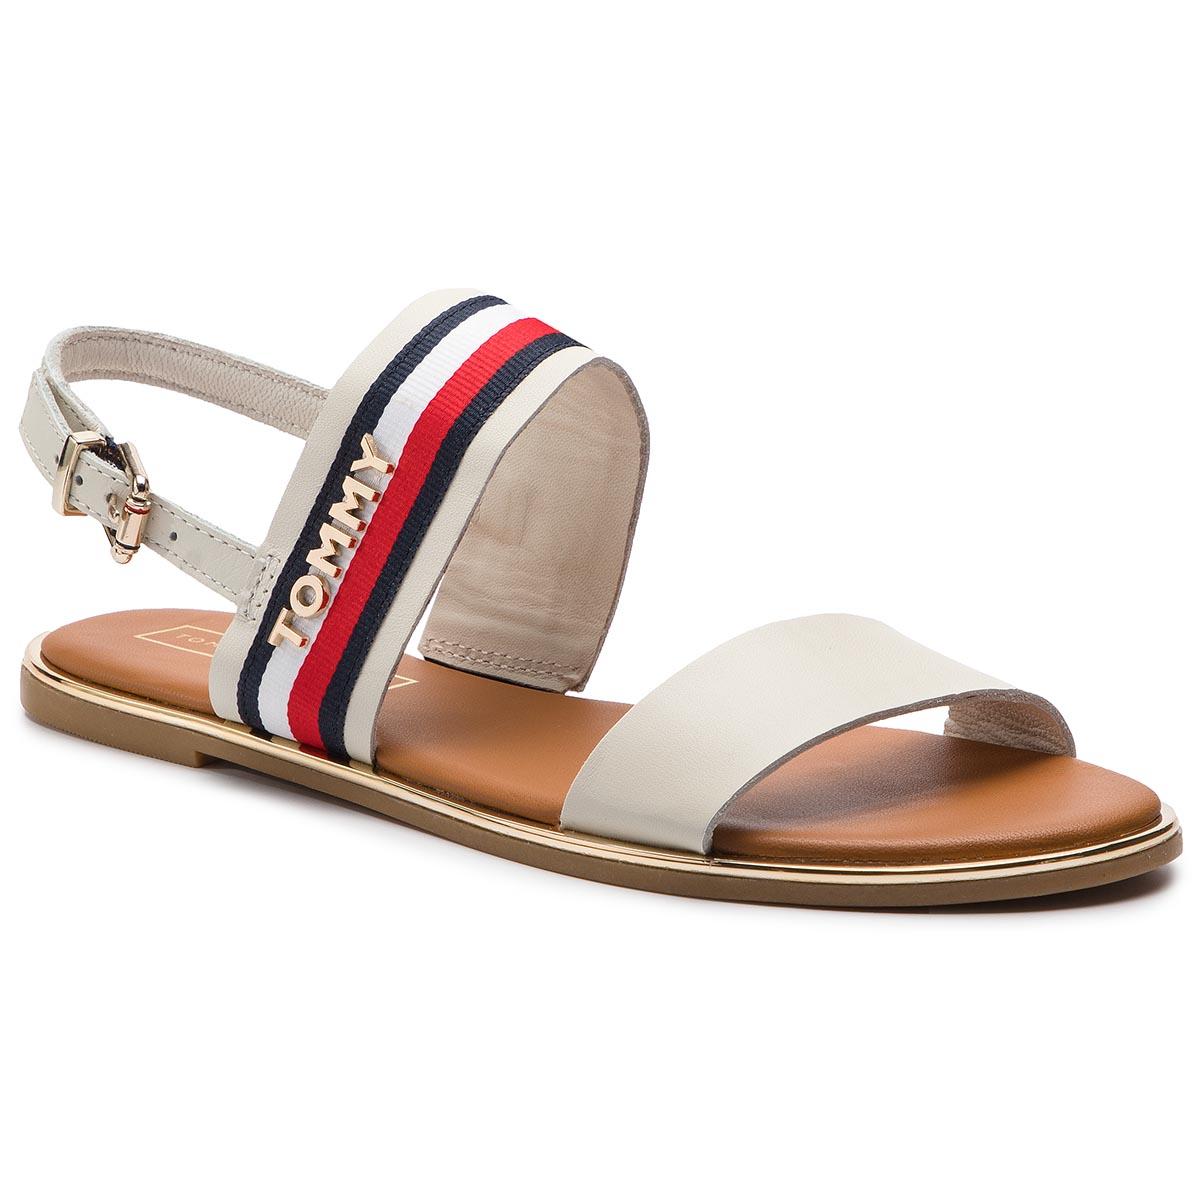 Sandále TOMMY HILFIGER - Flat Sandal Corporate Ribbon FW0FW04049 Whisper White 121